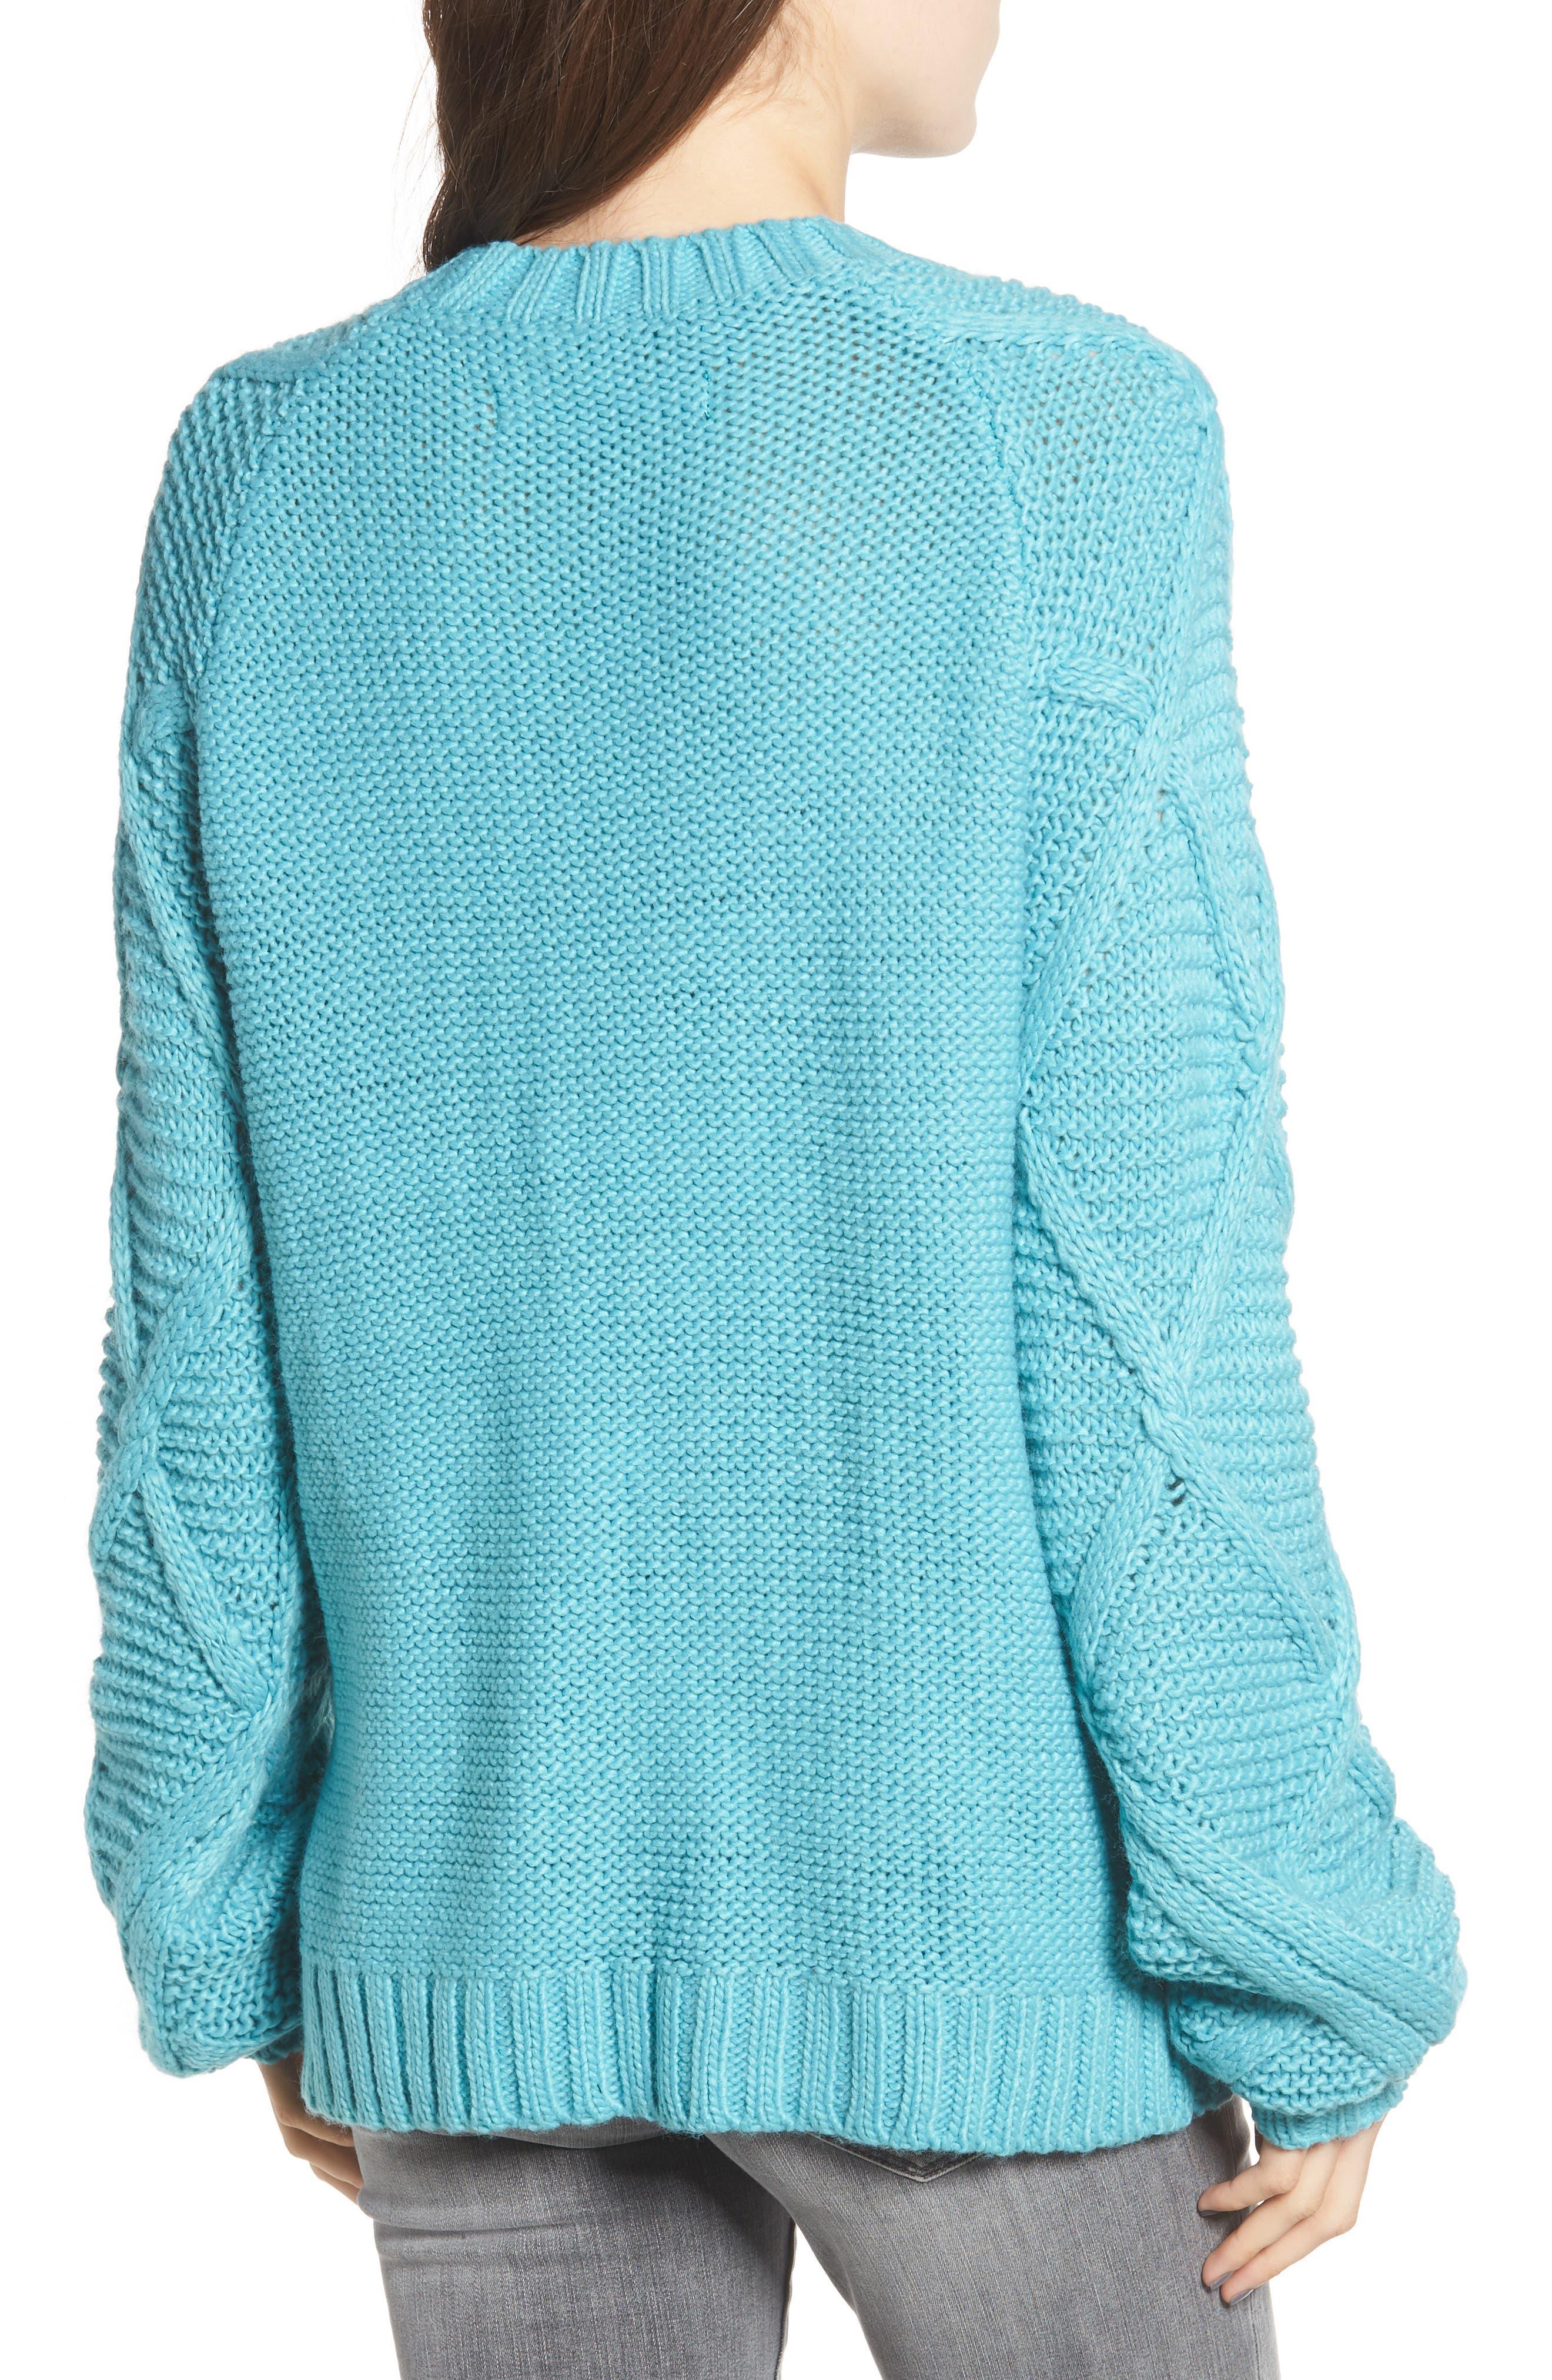 PROSPERITY DENIM, Cable Knit Sweater, Alternate thumbnail 2, color, 400